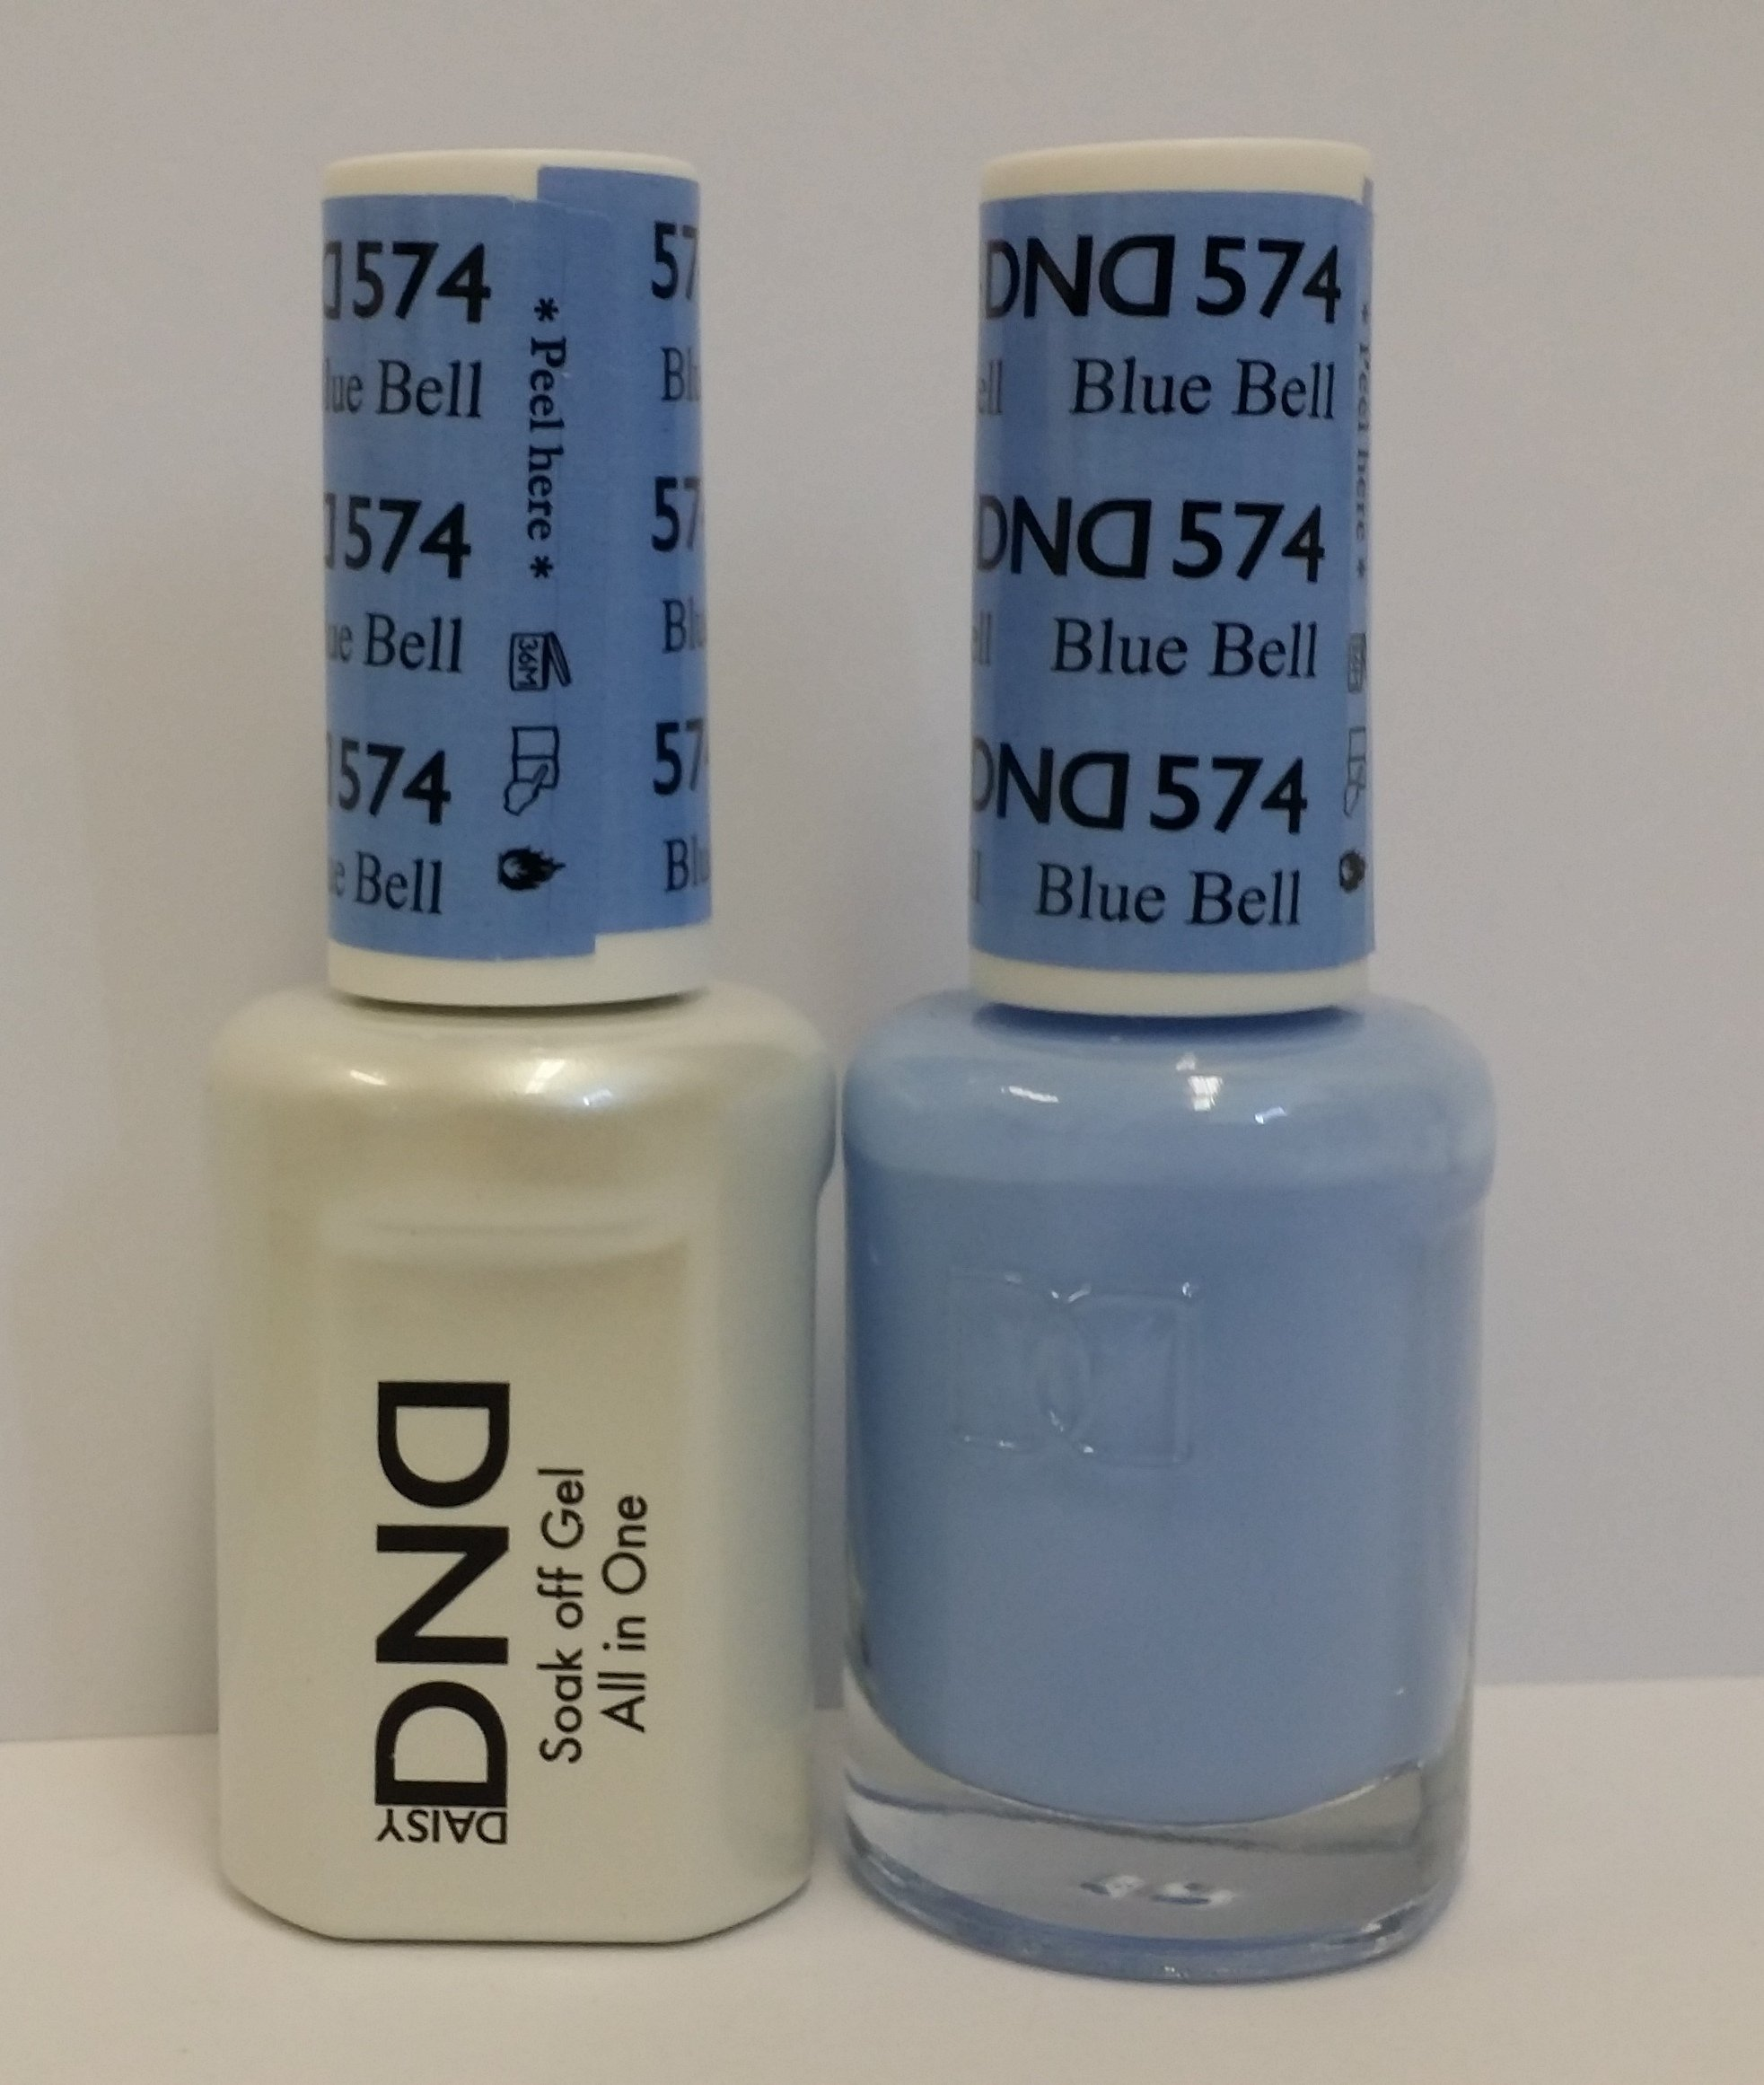 Amazon.com: DND Gel & Matching Polish Set (569 - Green spring, KY ...